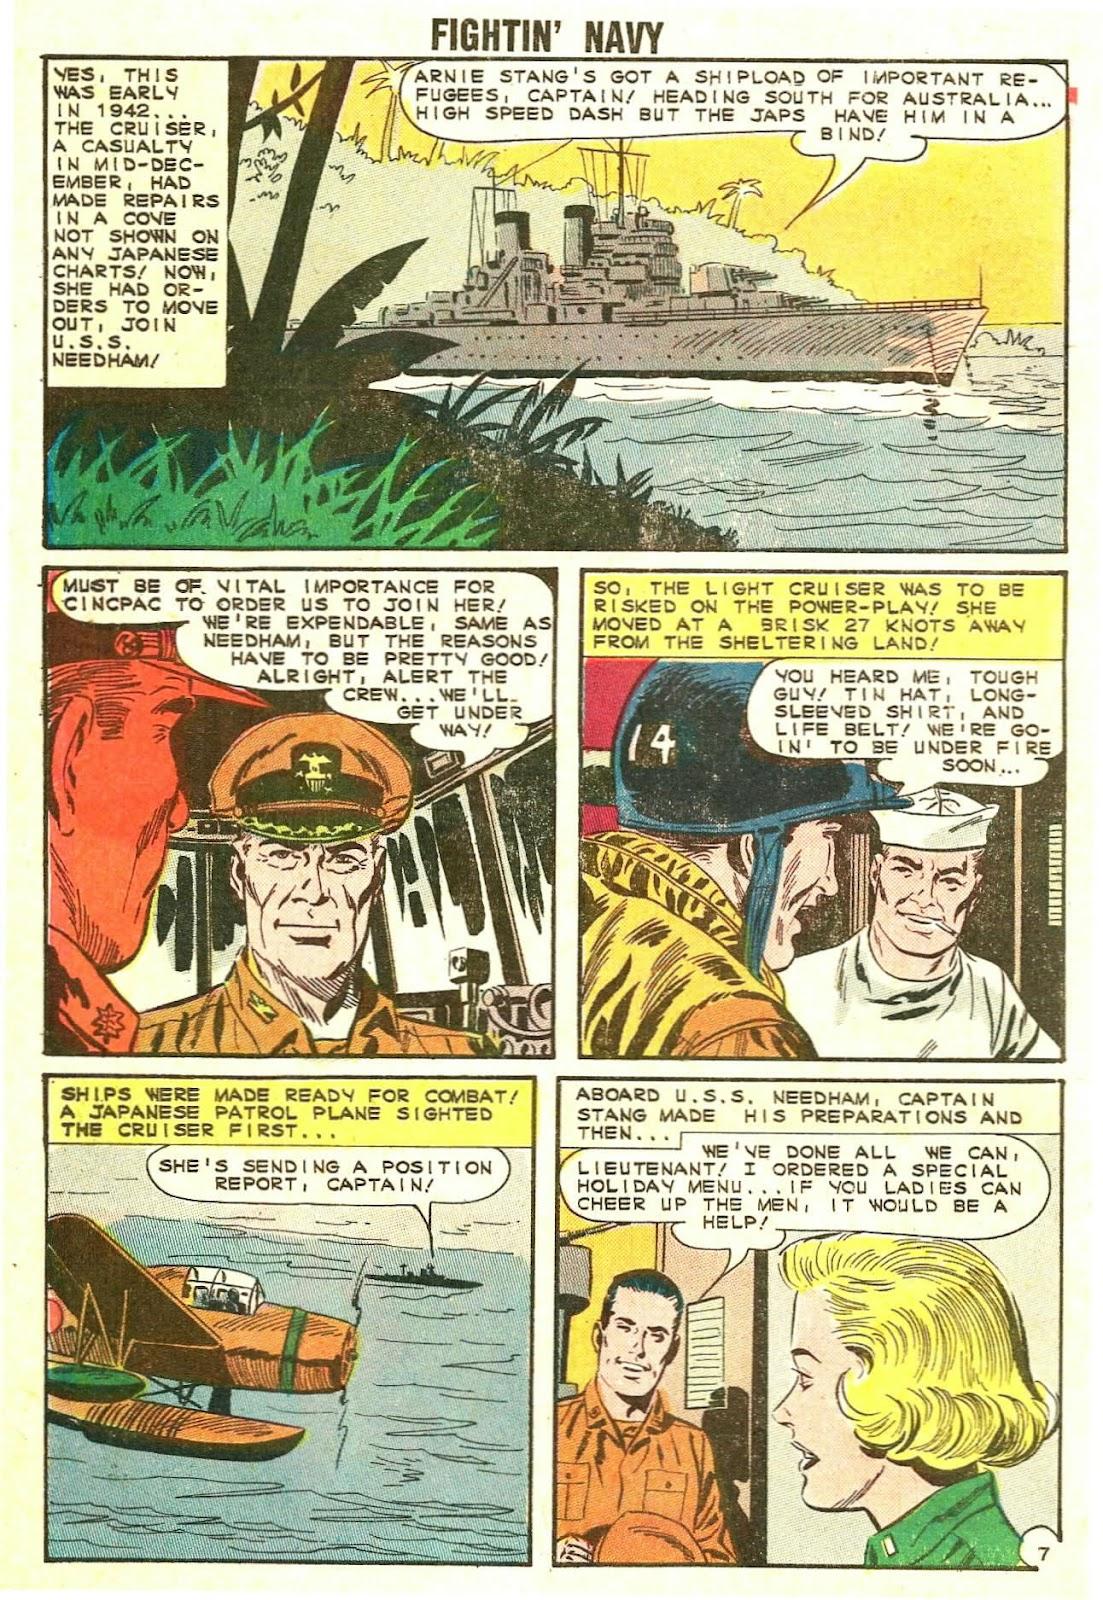 Read online Fightin' Navy comic -  Issue #114 - 10